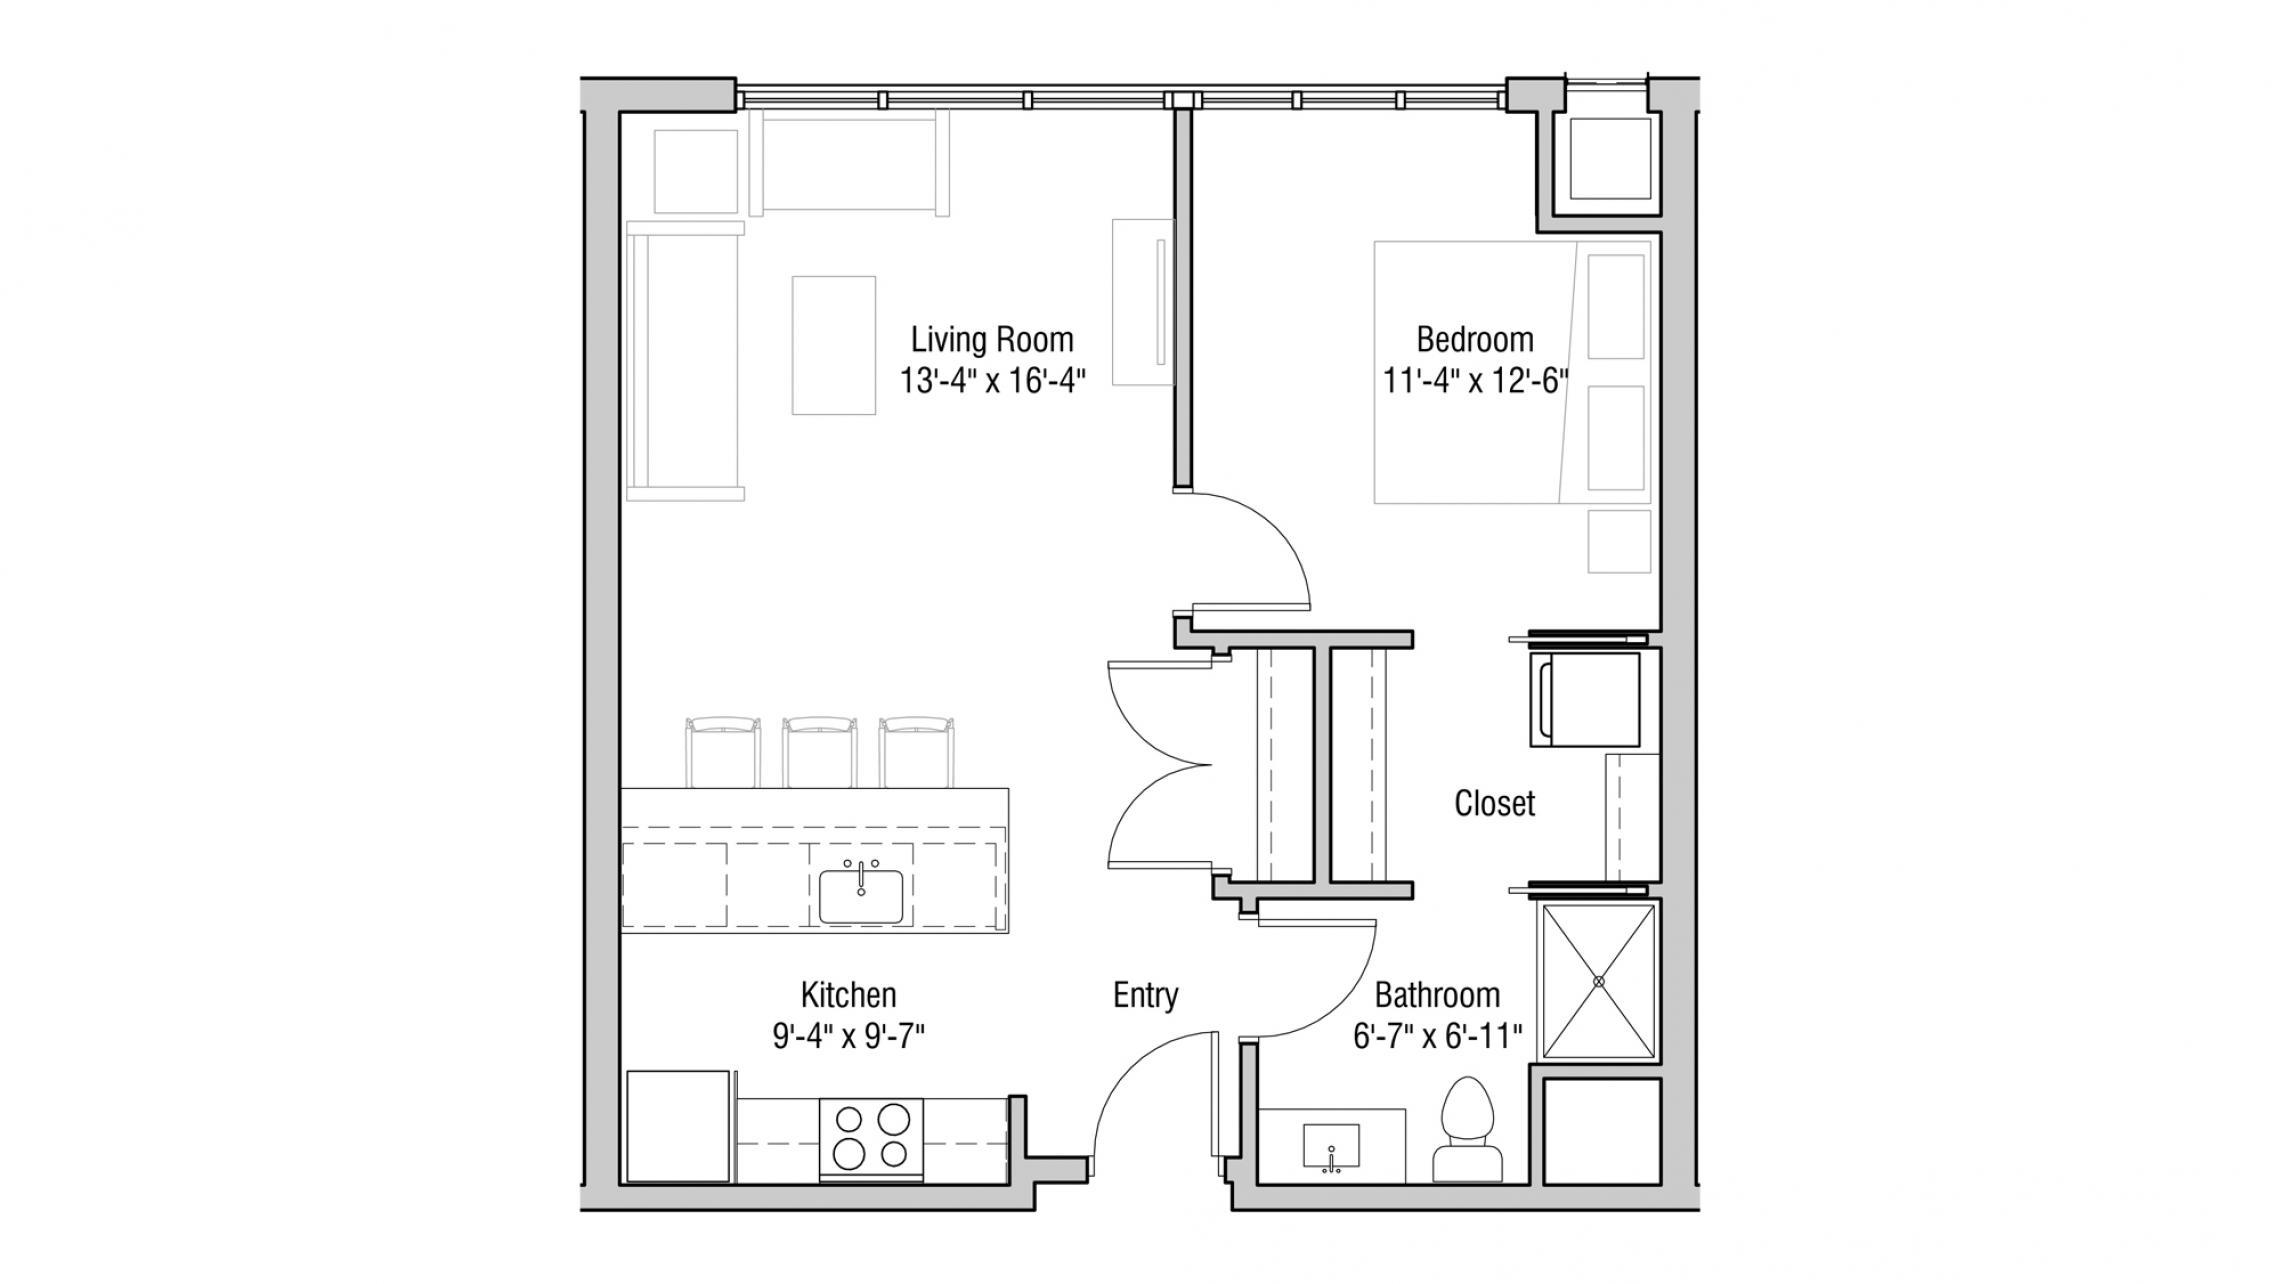 ULI Quarter Row 423 - One Bedroom, One Bathroom